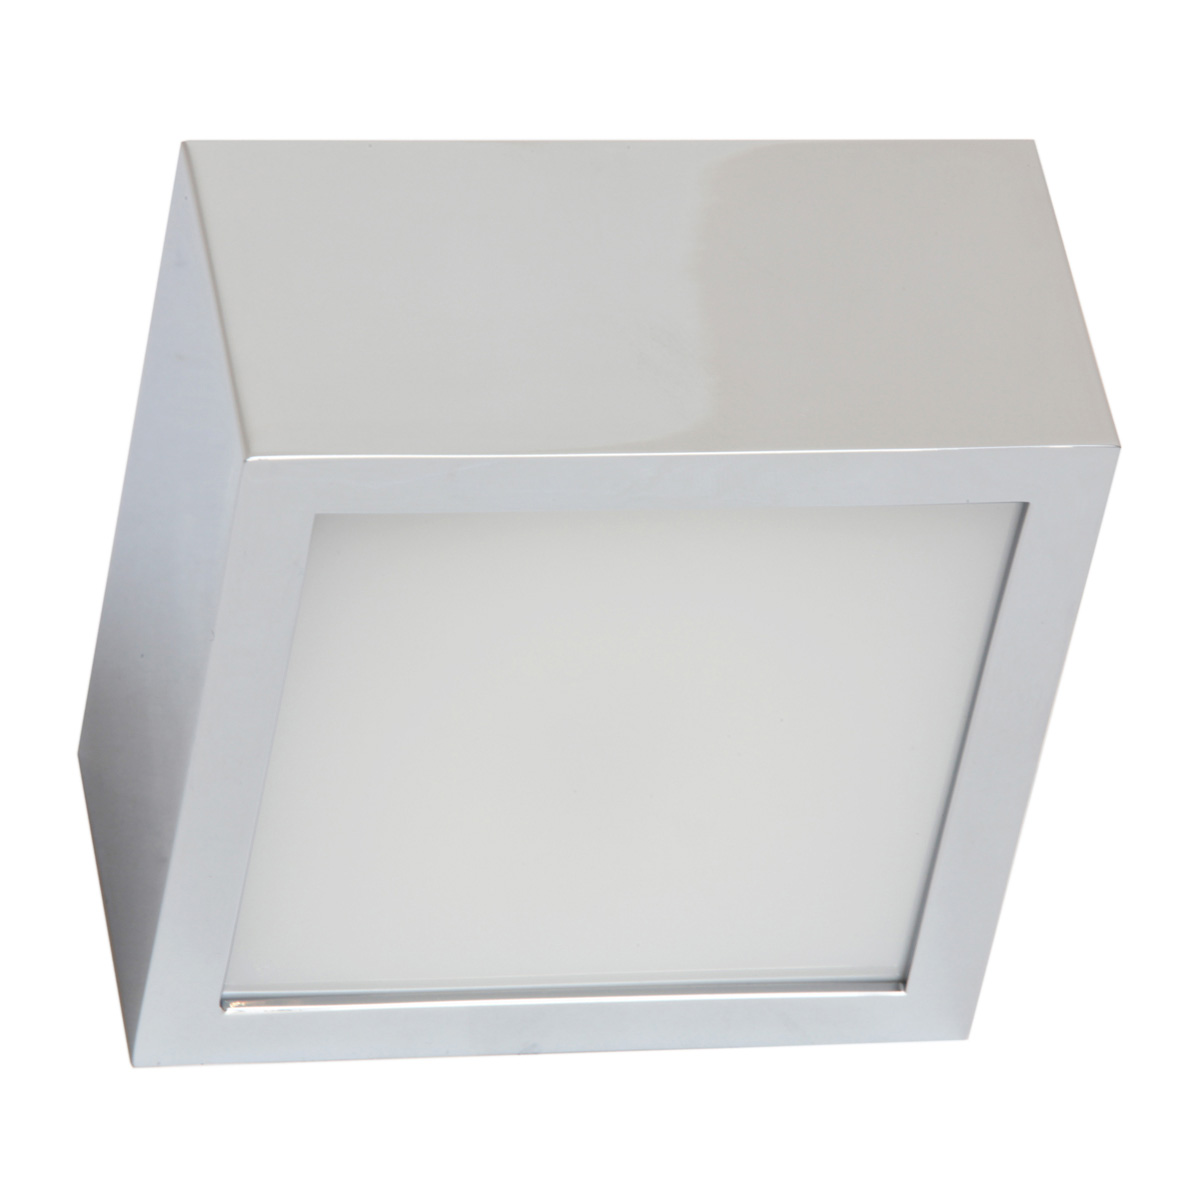 karree led exklusive badezimmer-deckenlampe ip44 - casa lumi